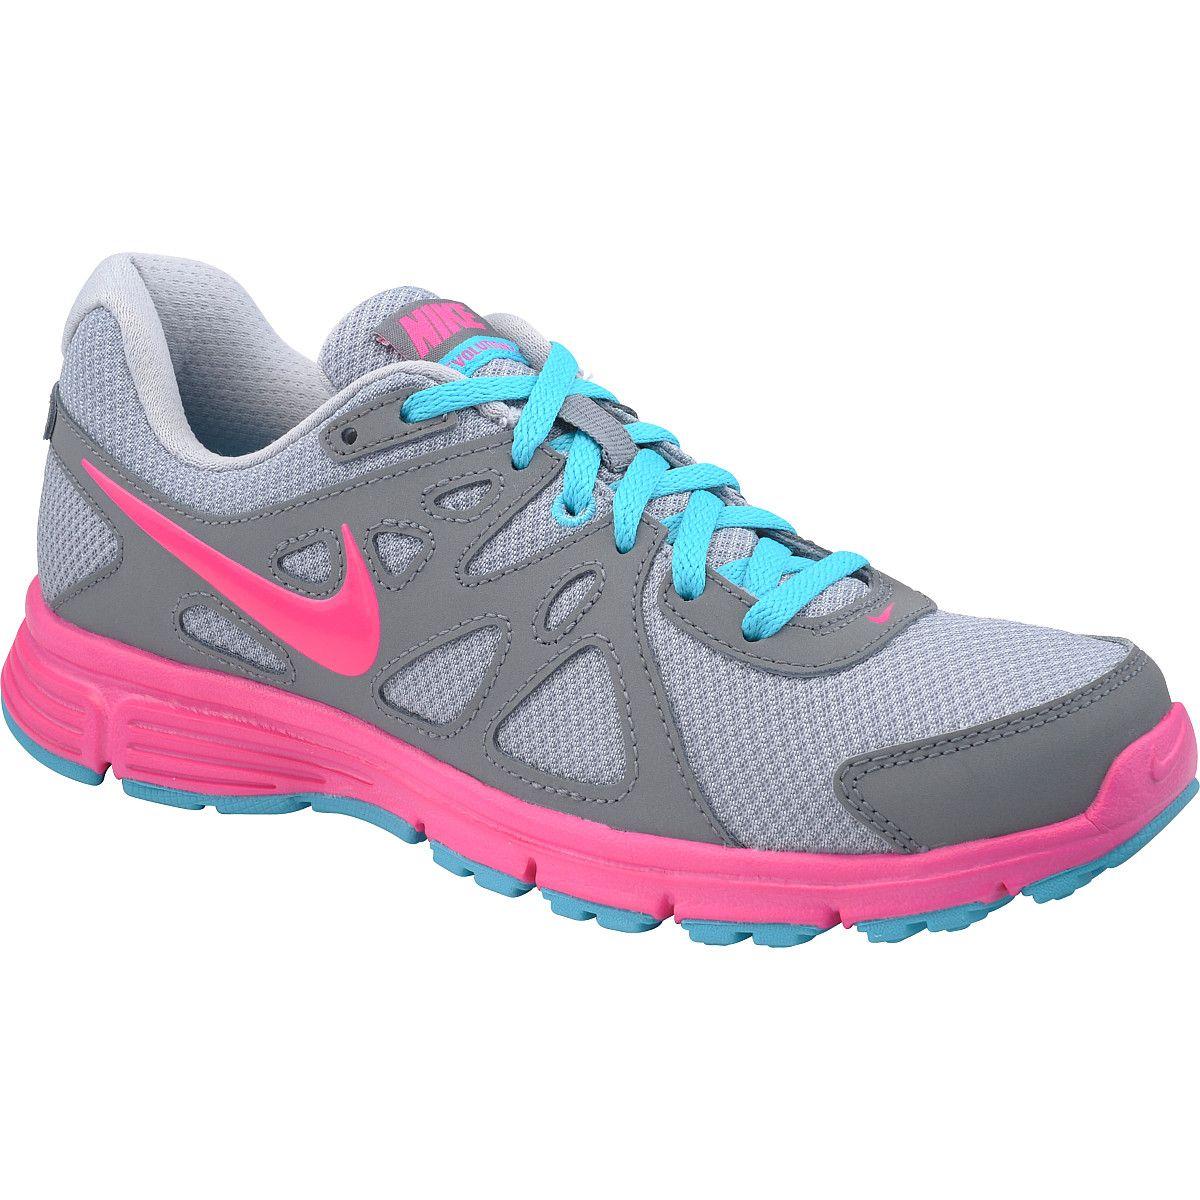 NIKE Women's Revolution 2 Running Shoes SportsAuthority